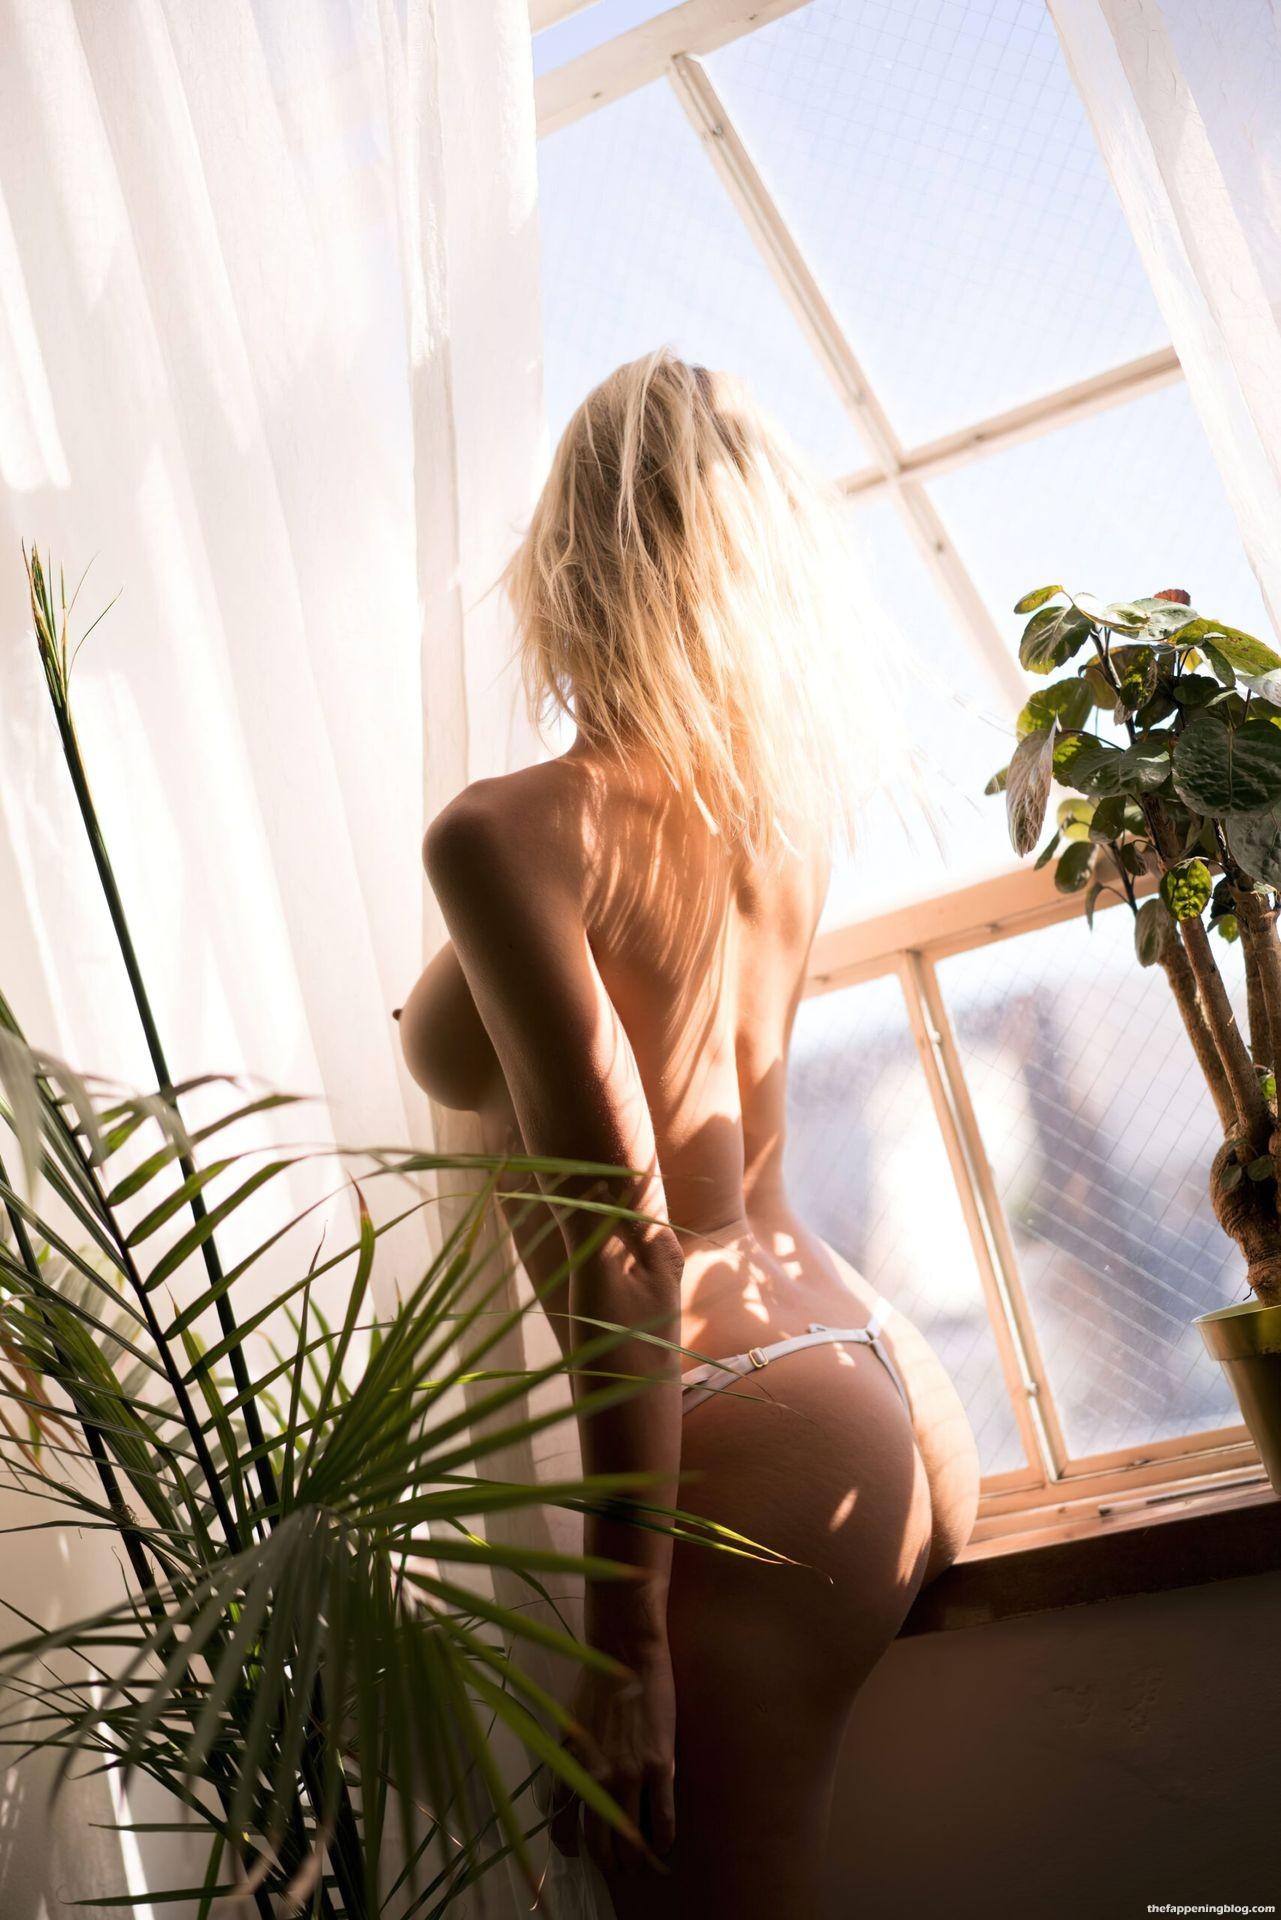 Joy-Corrigan-Naked-Tits-and-Ass-14-scaled1-thefappeningblog.com_.jpg